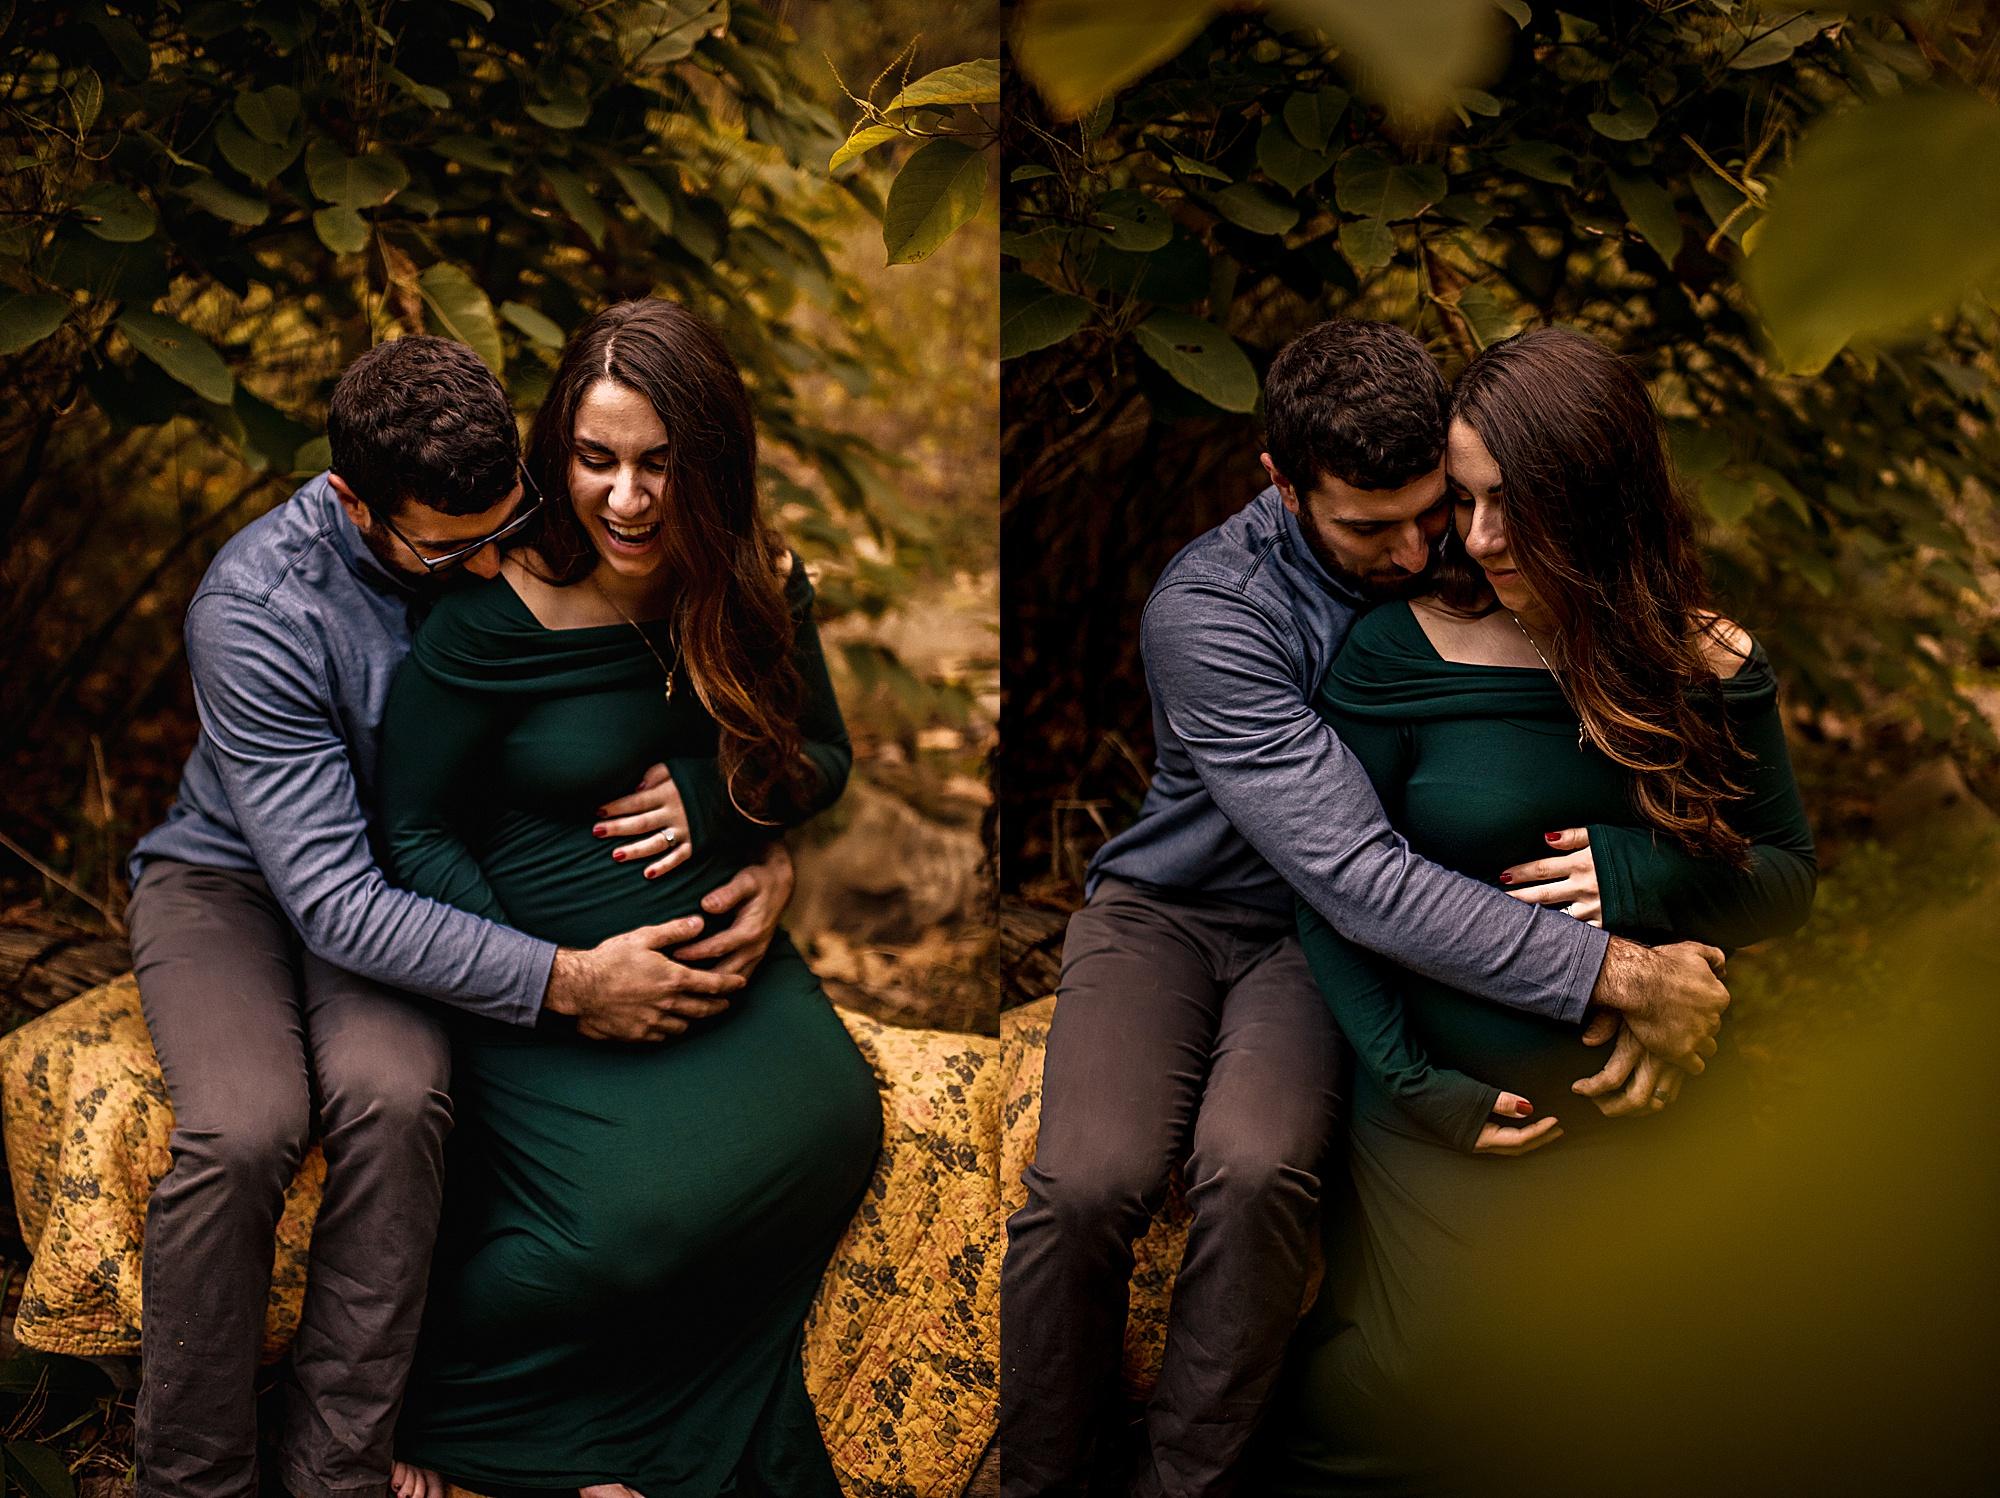 lauren-grayson-photography-akron-ohio-maternity-session-fall-hammer_0029.jpg